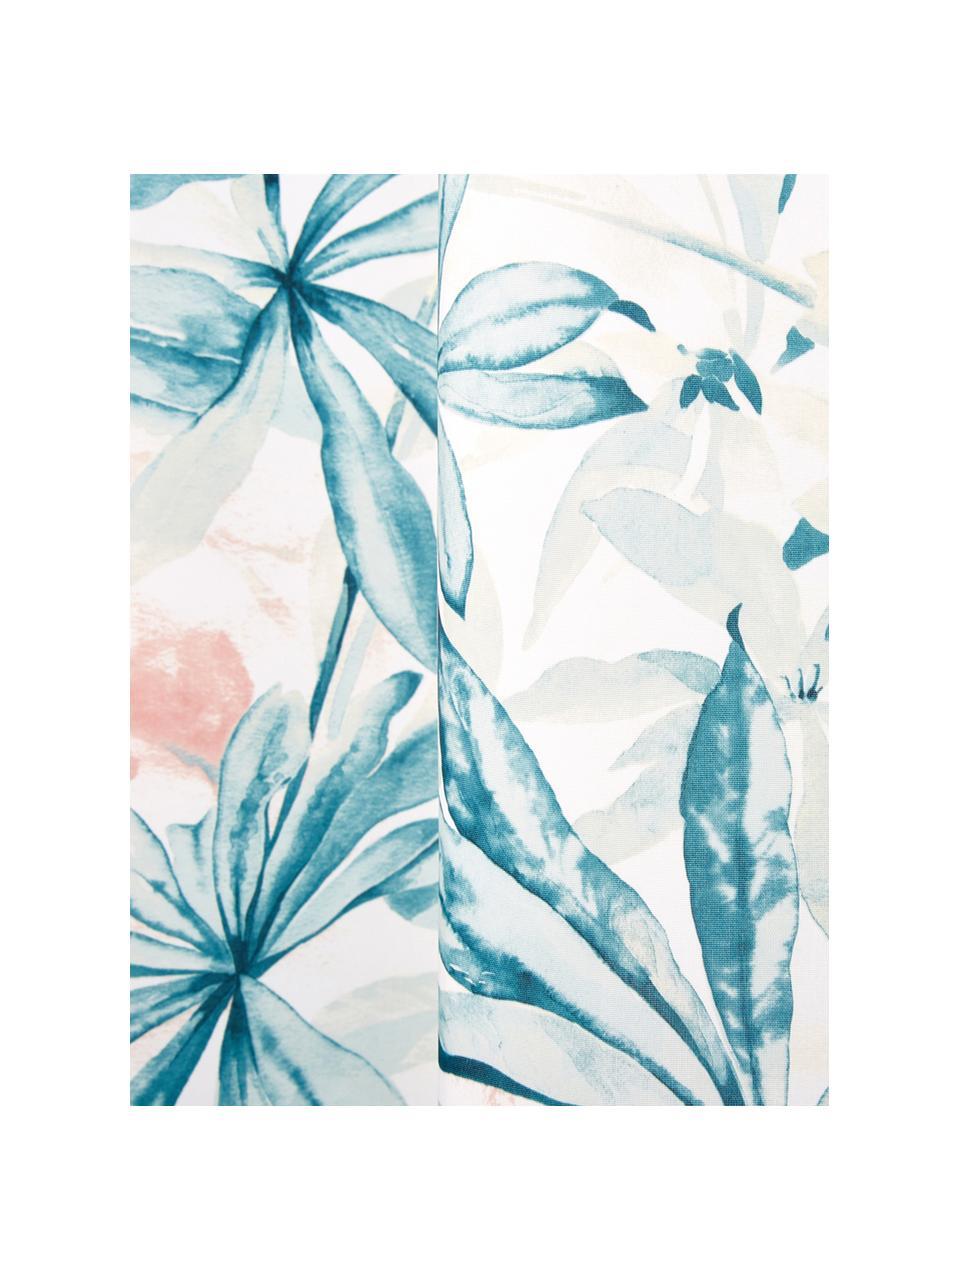 Rideau de douche imprimé tropical Foglia, Blanc, multicolore